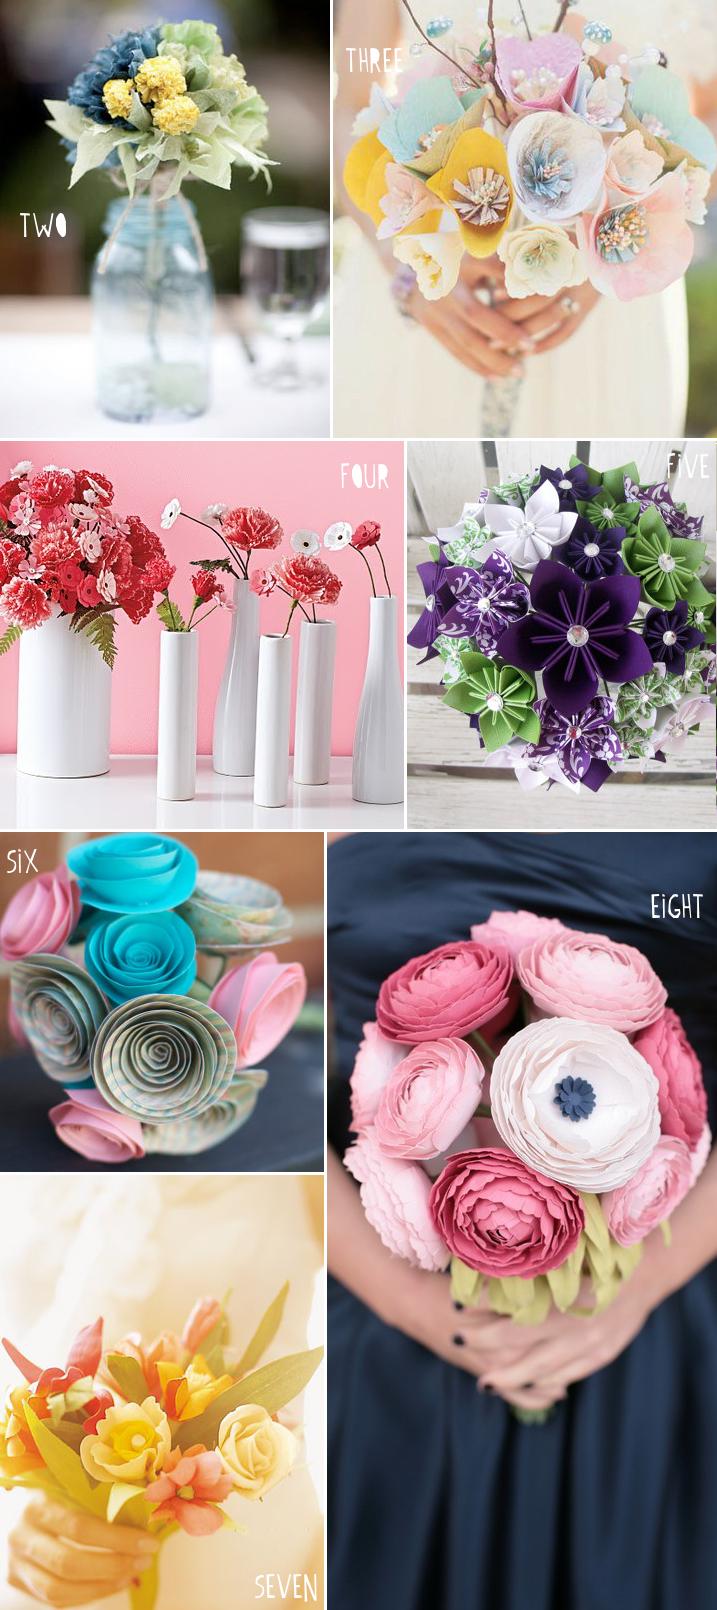 DIY Make your own flowers  flower bouquet flower centerpiece etc